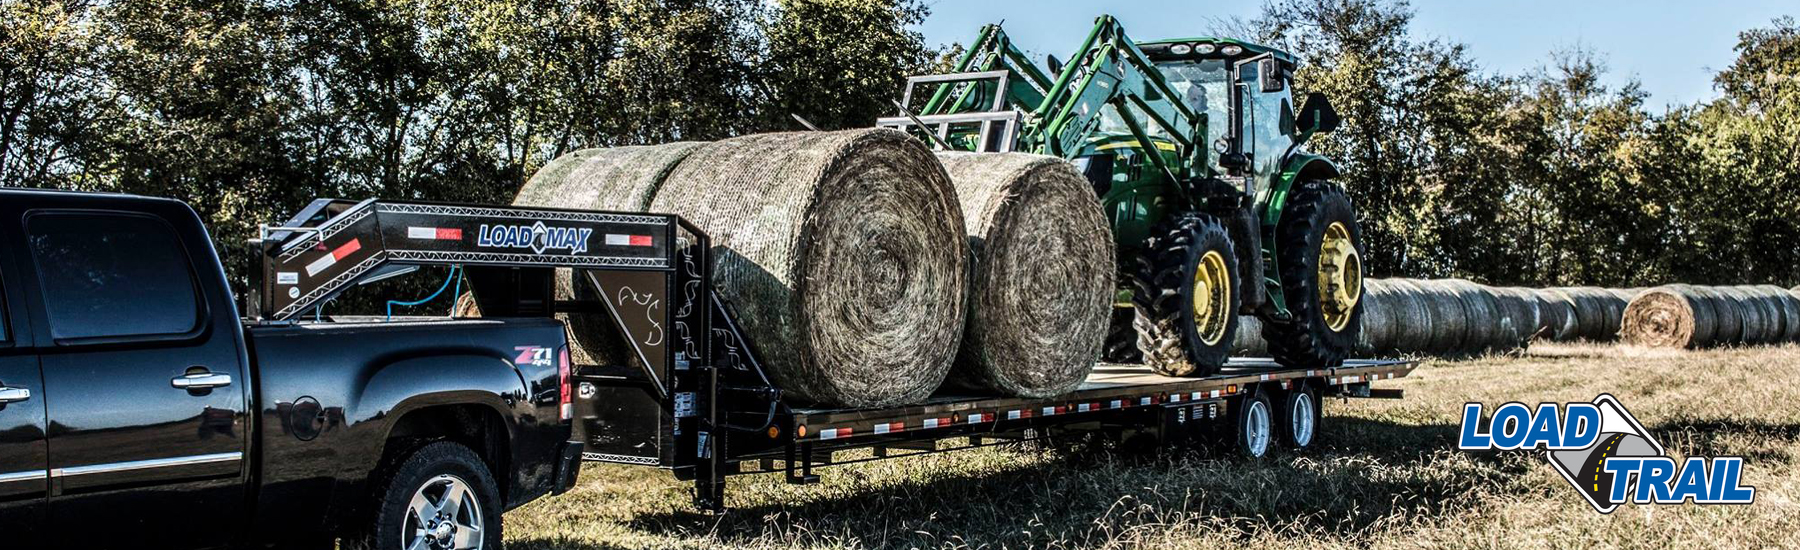 hight resolution of home cox trailer and equipment sales in upper marlboro maryland virginia washington dc area